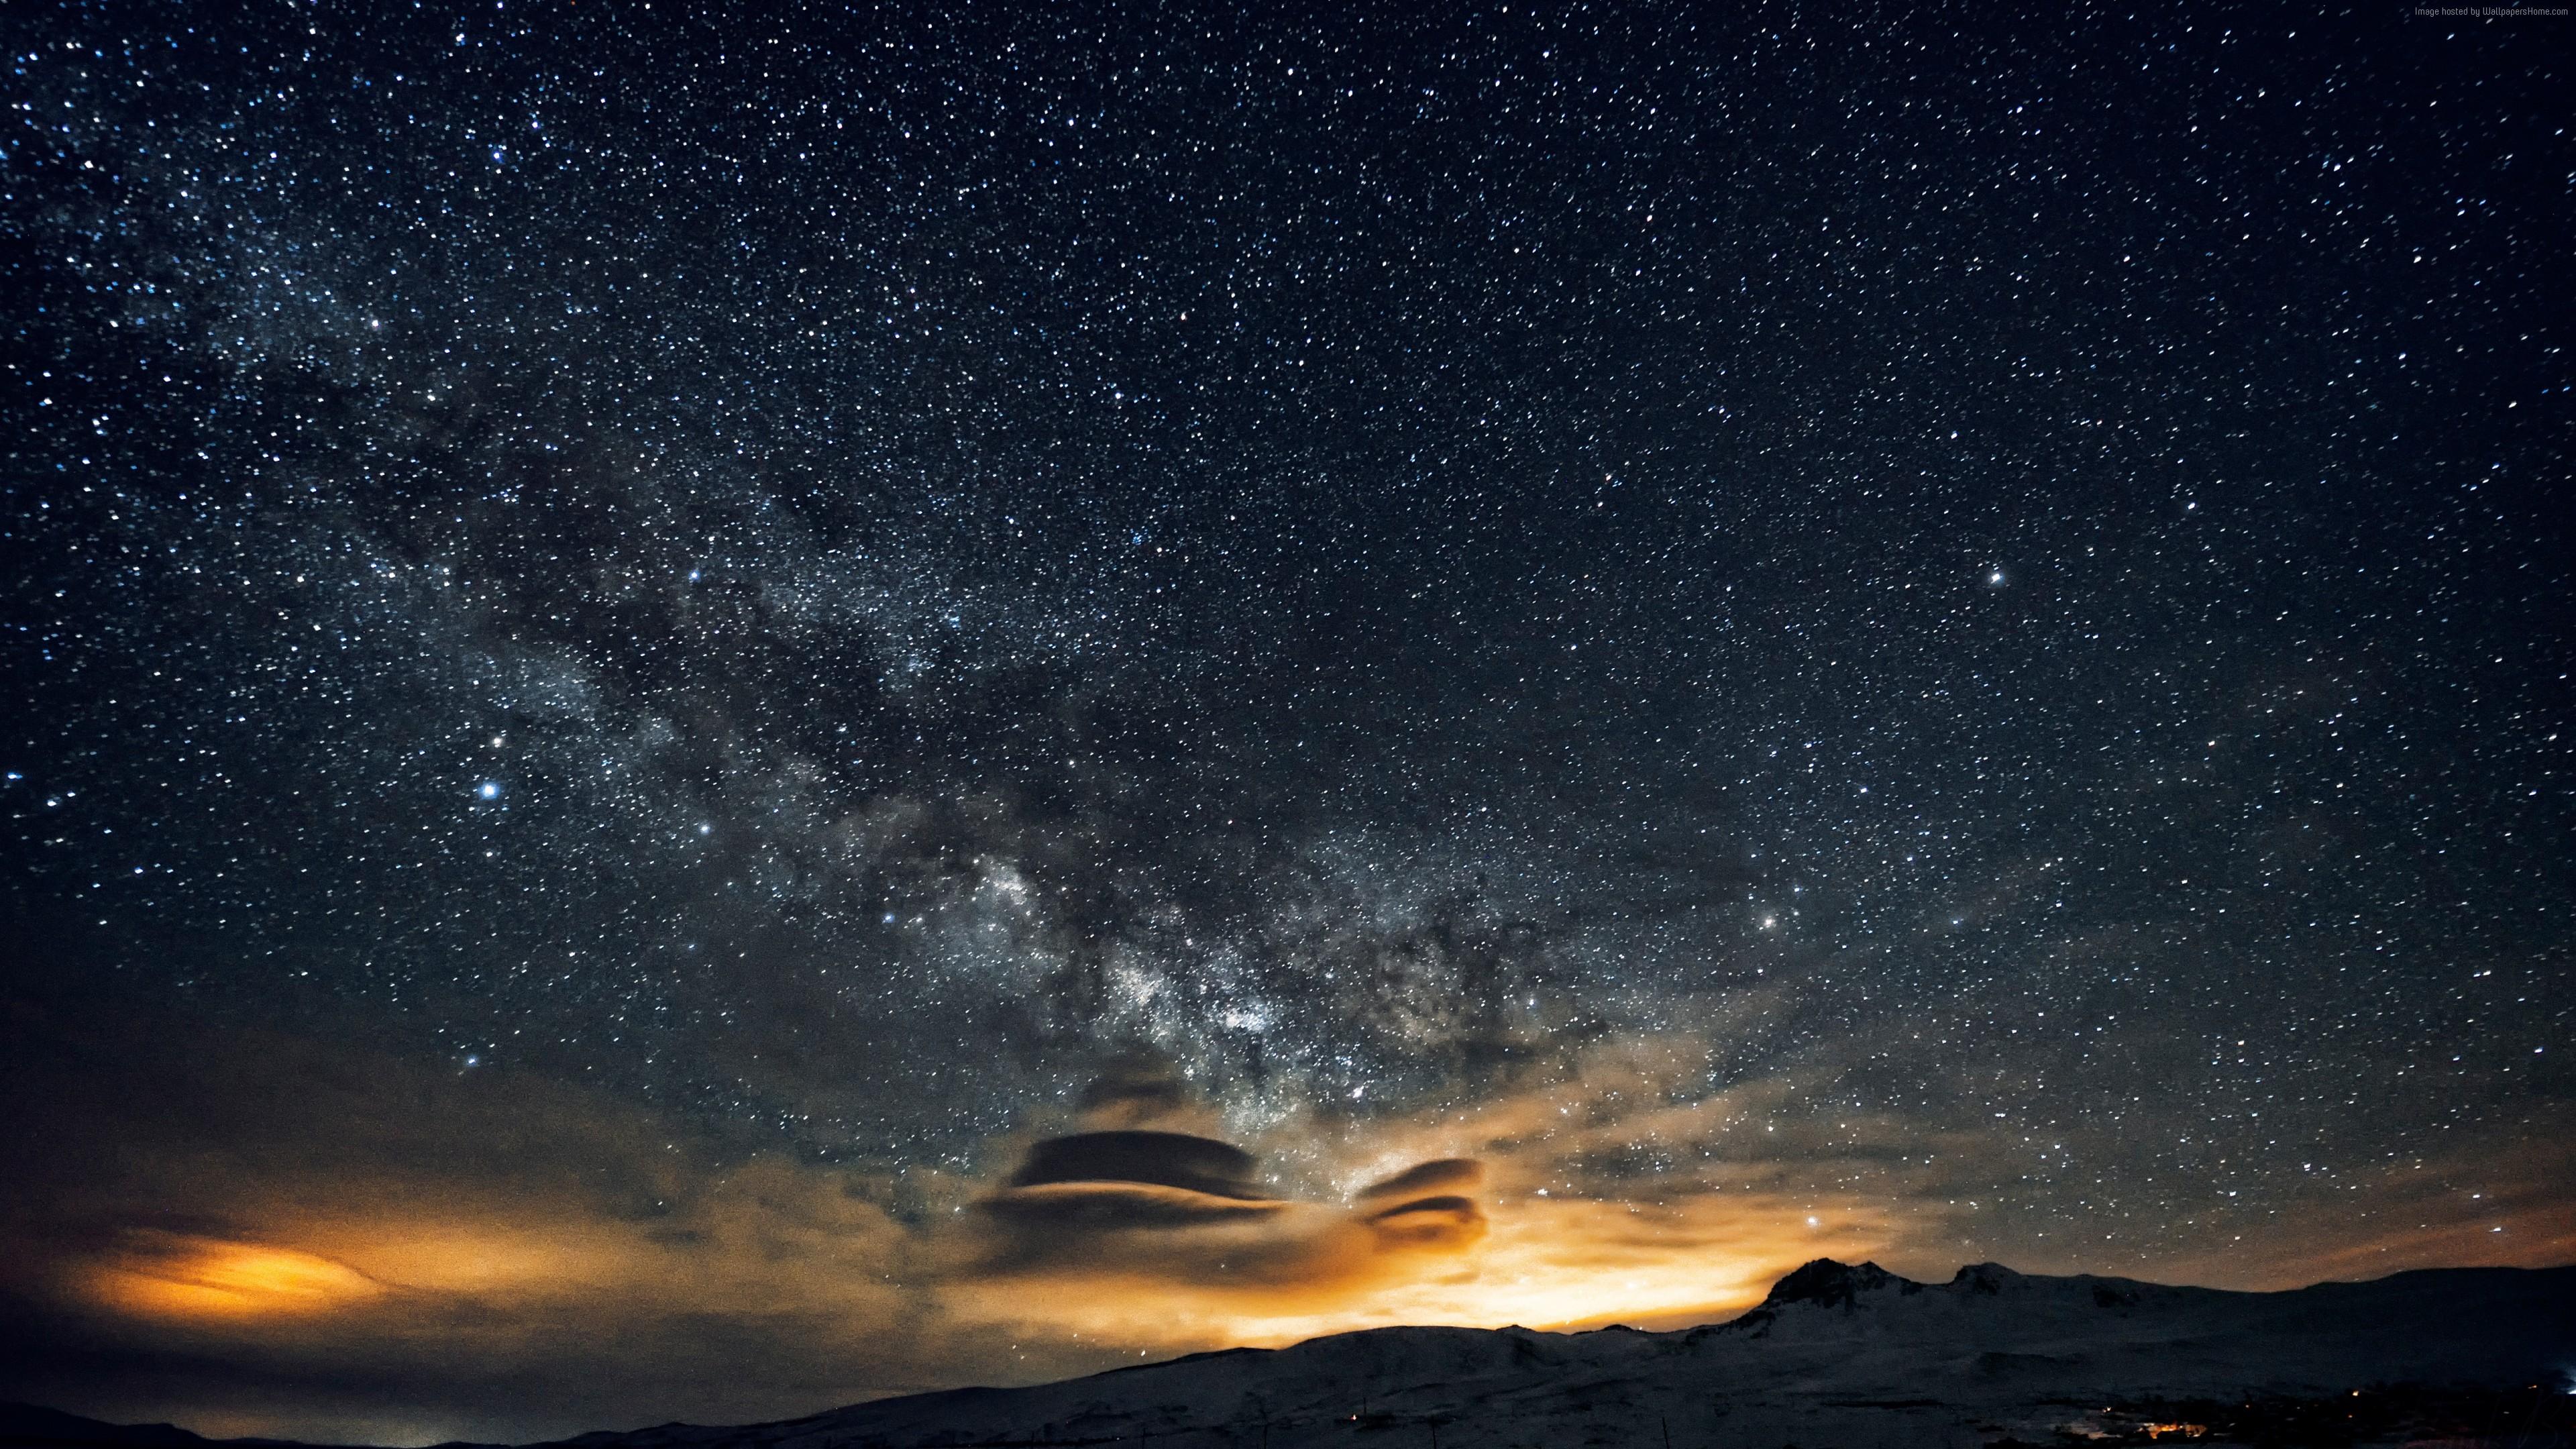 2880x1800 Stars Nebula Macbook Pro Retina Hd 4k Wallpapers